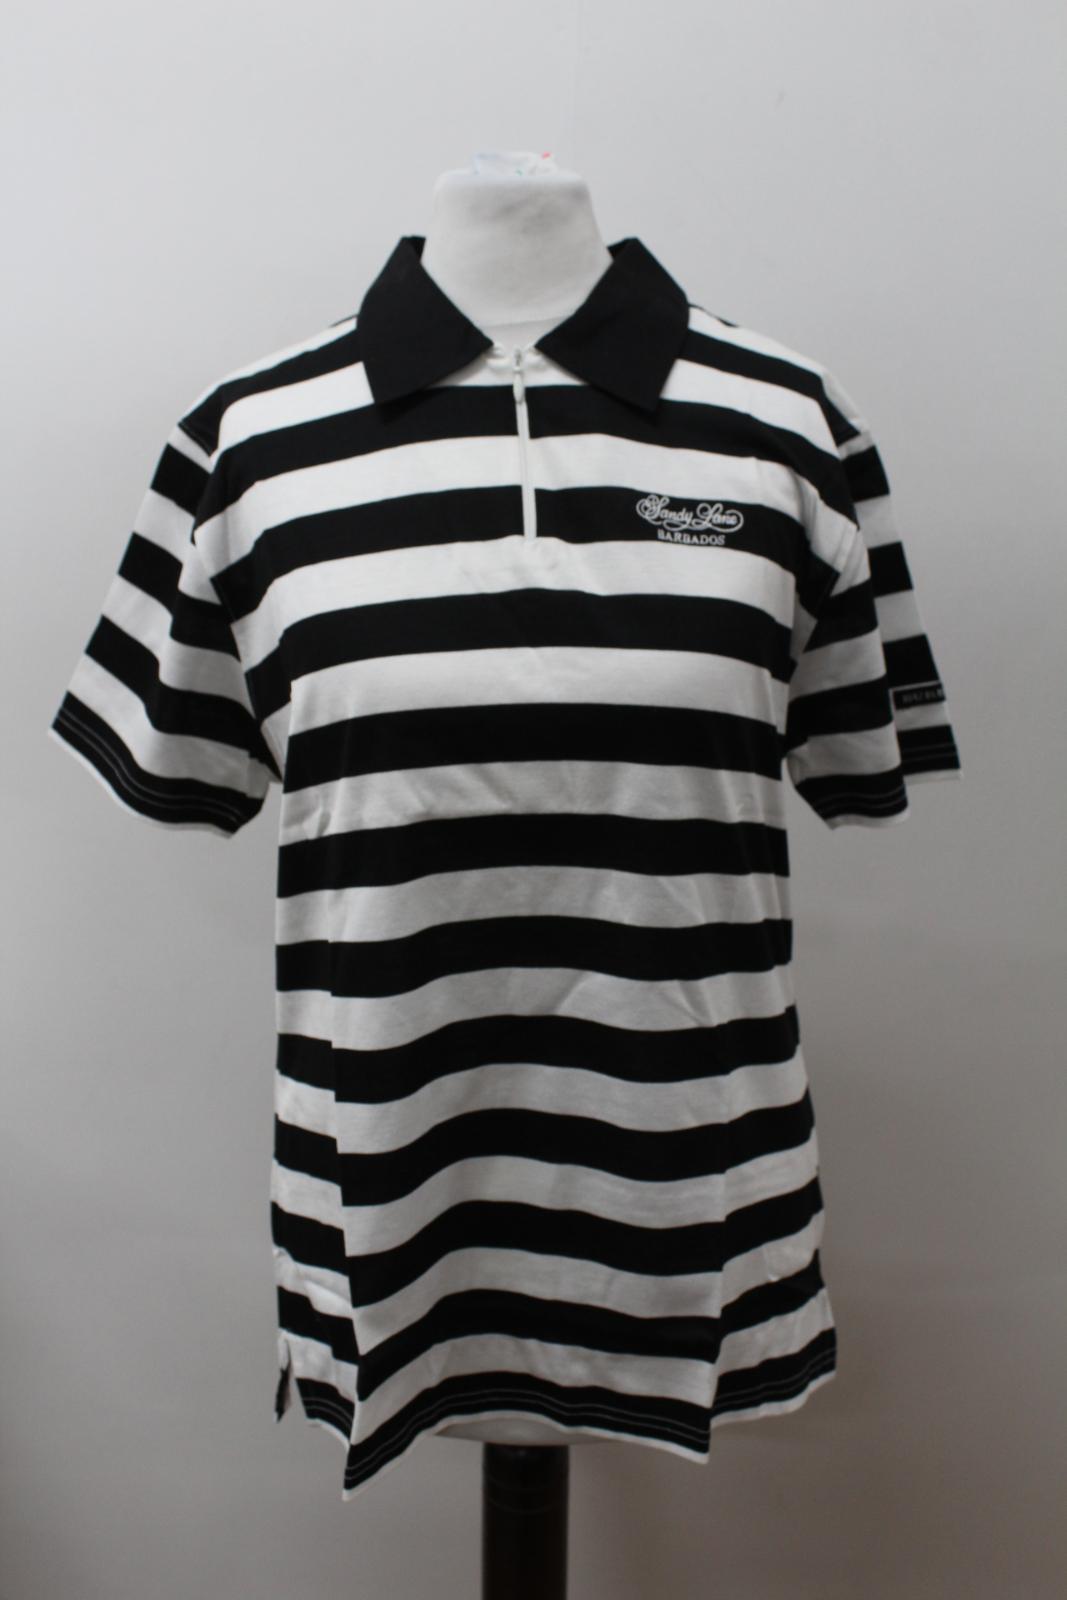 BURBERRY-GOLF-Ladies-Black-White-Cotton-Short-Sleeve-Striped-Polo-Shirt-S-BNWT thumbnail 7